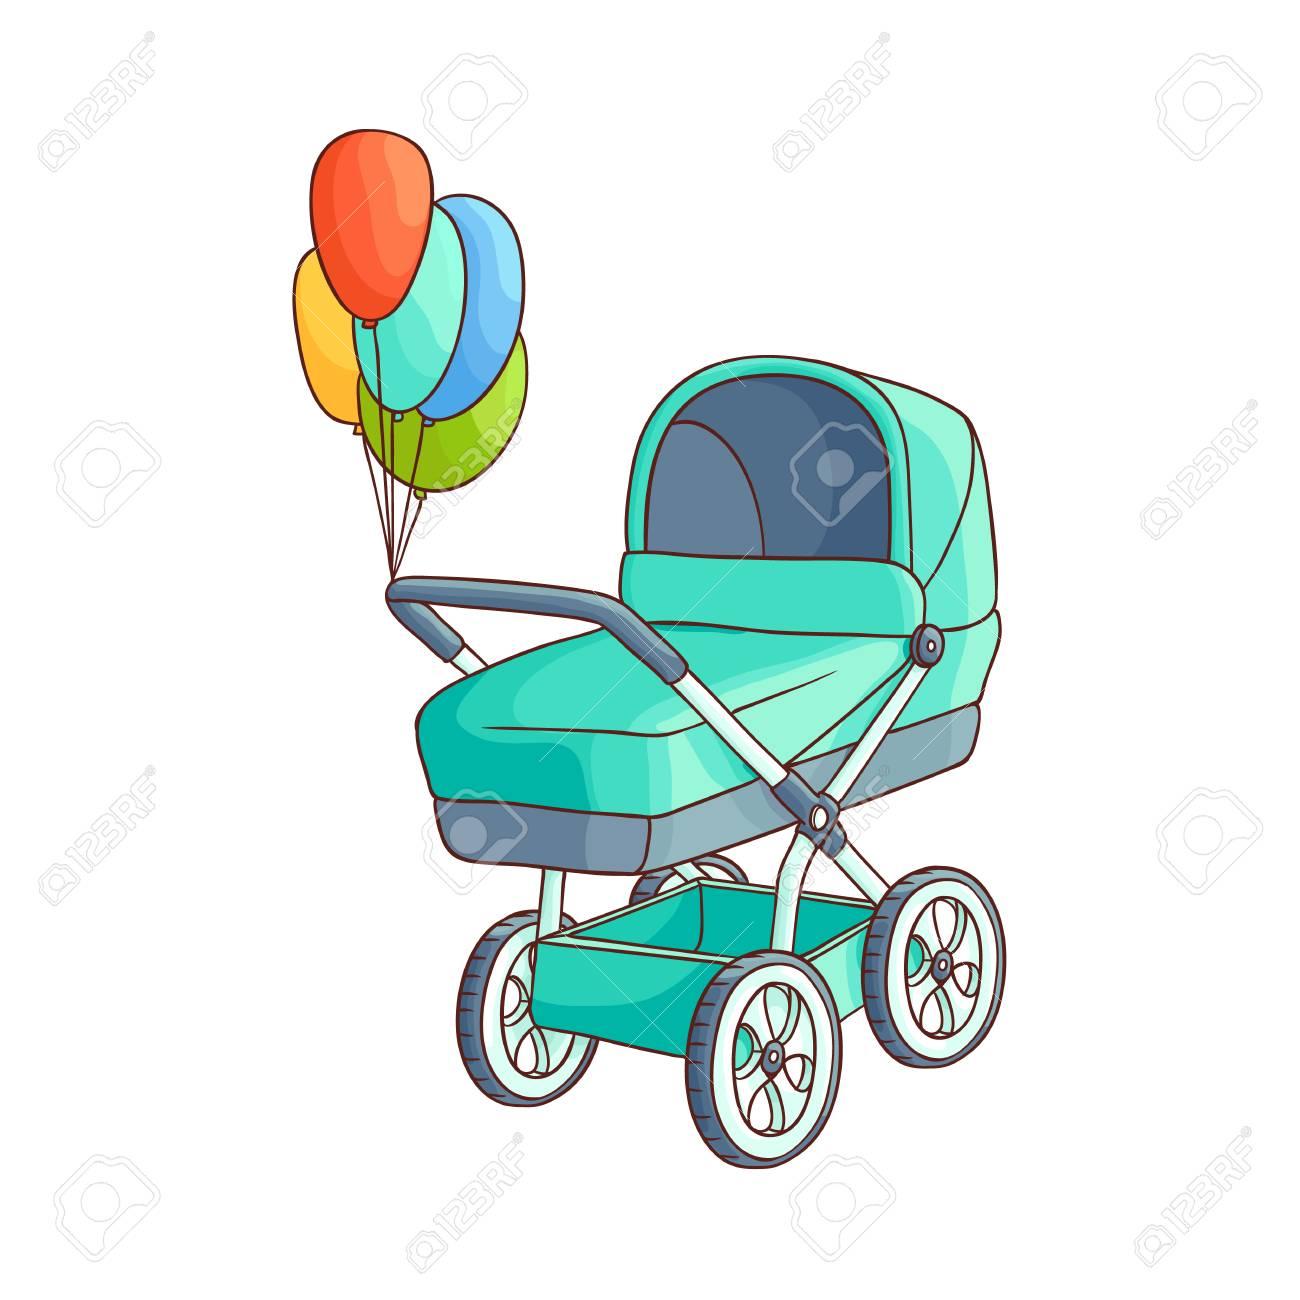 Vector cochecito de bebé o cochecito de dibujos animados plana, cochecito de niño cochecito azul con globos de aire de felicitación. Ilustración